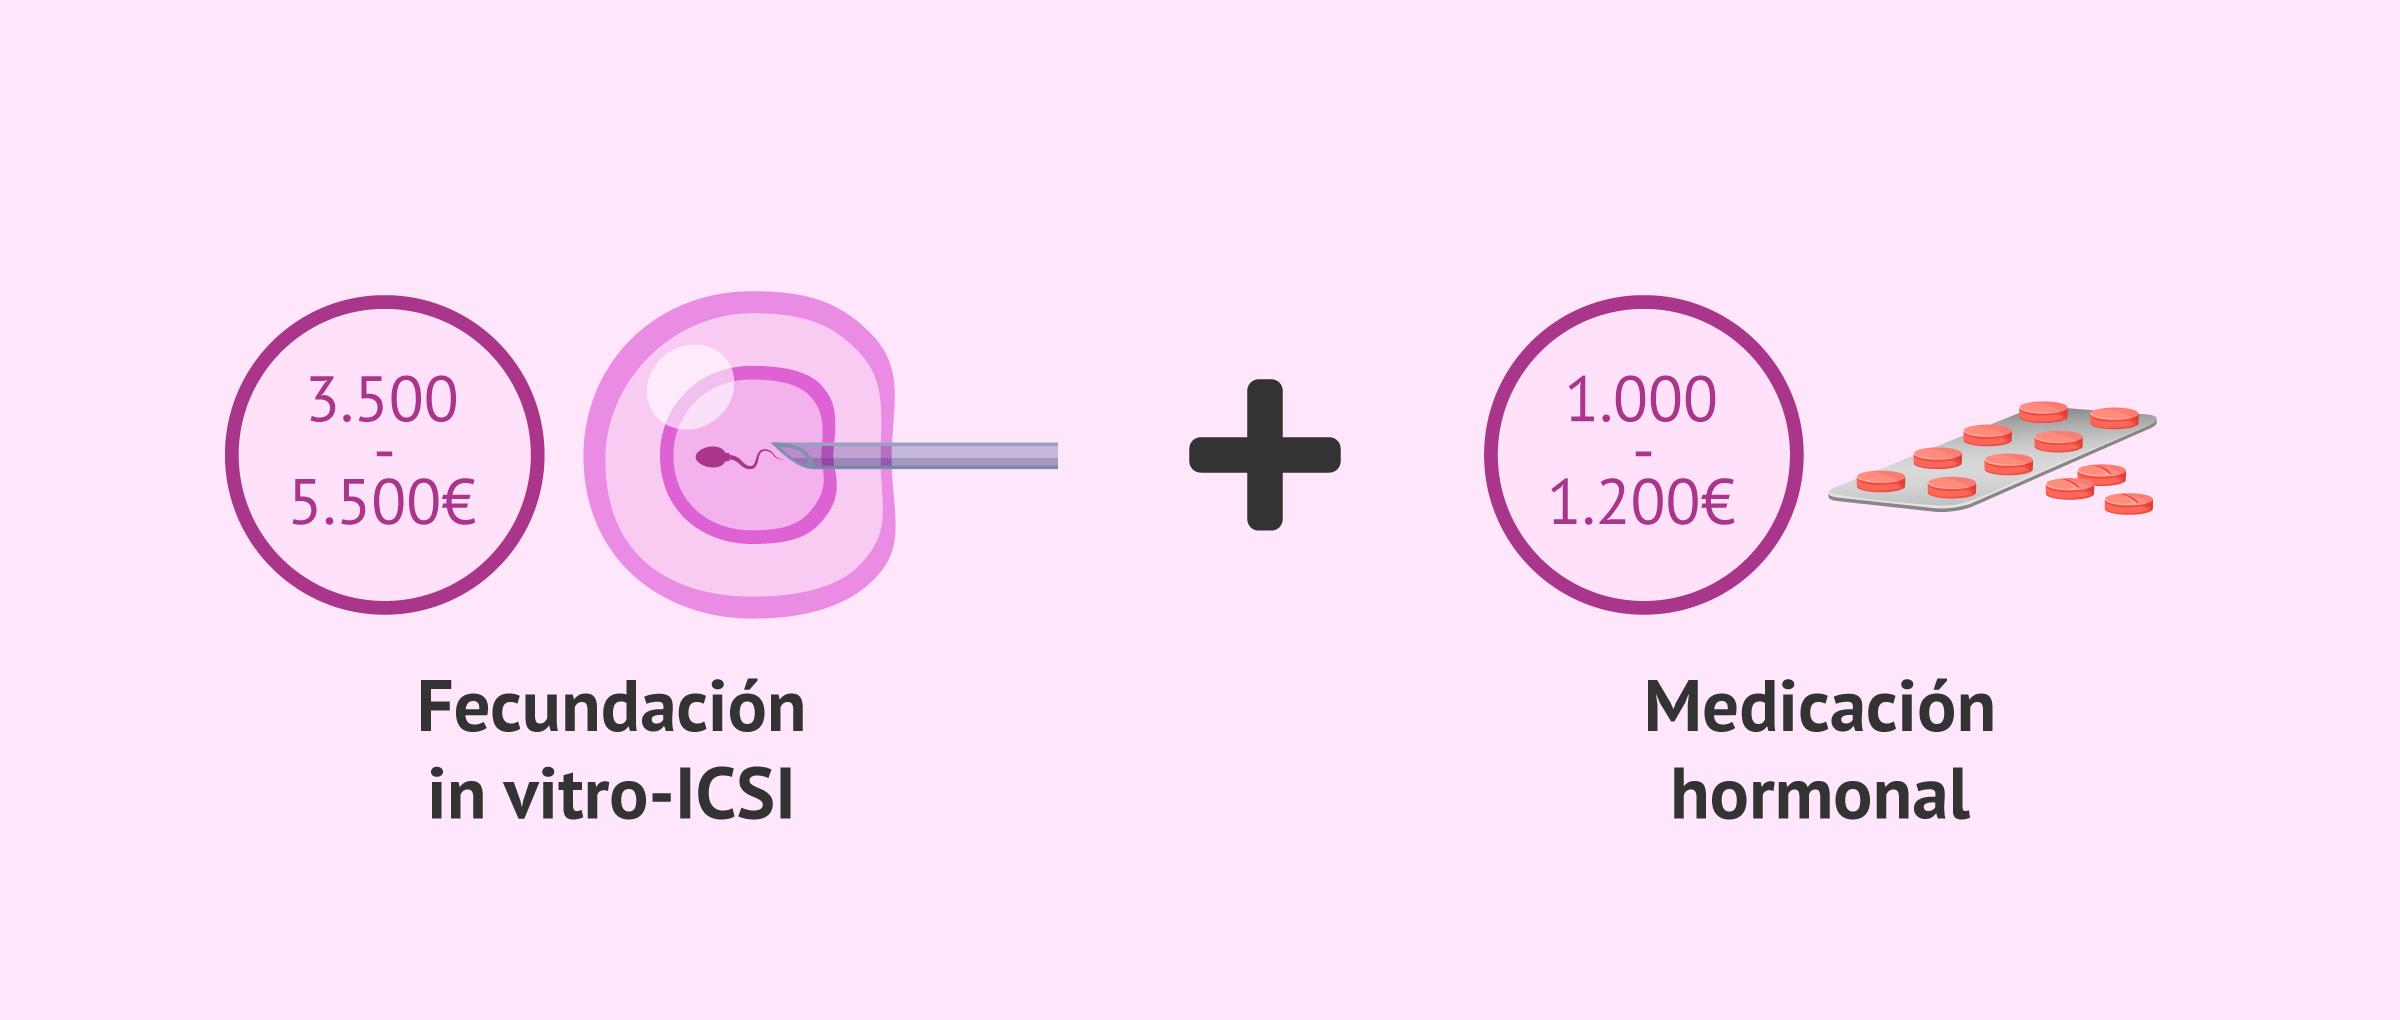 ¿Cuánto vale la ICSI?